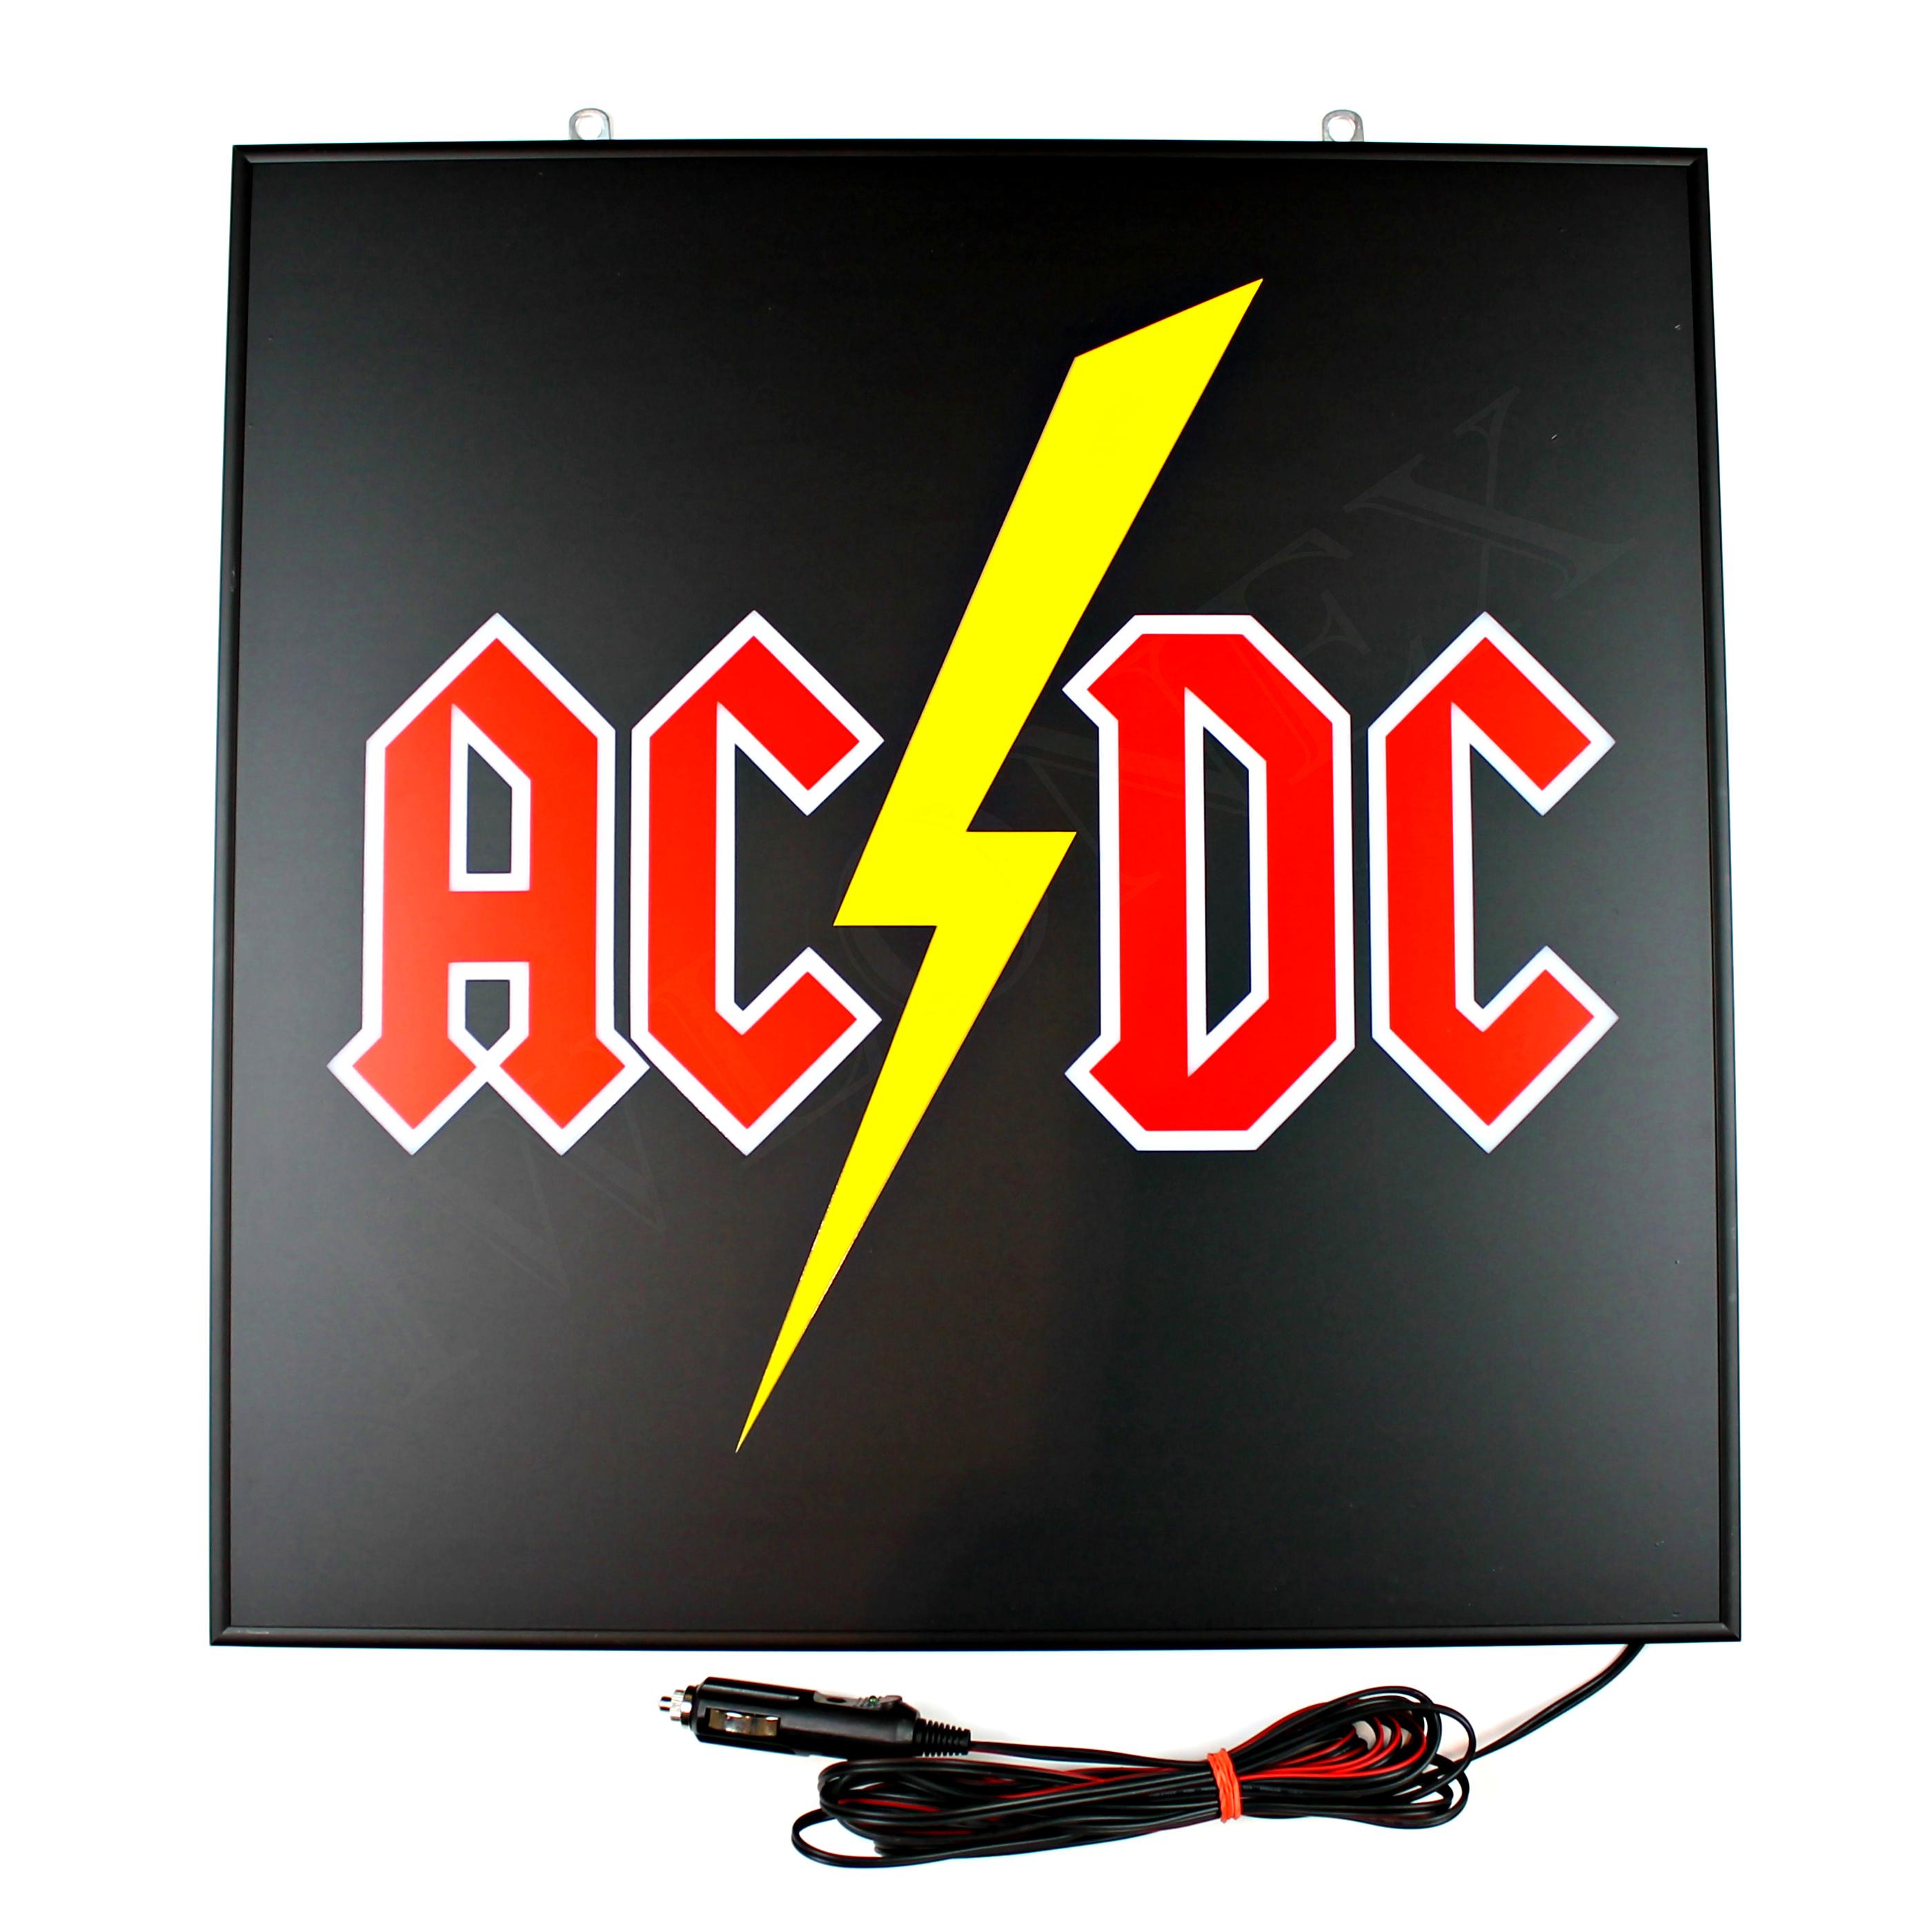 LED Schilder 46x46 ACDC 1 - 1 x LKW LED Rückwandschild mit Dimmer, 24V AC/DC